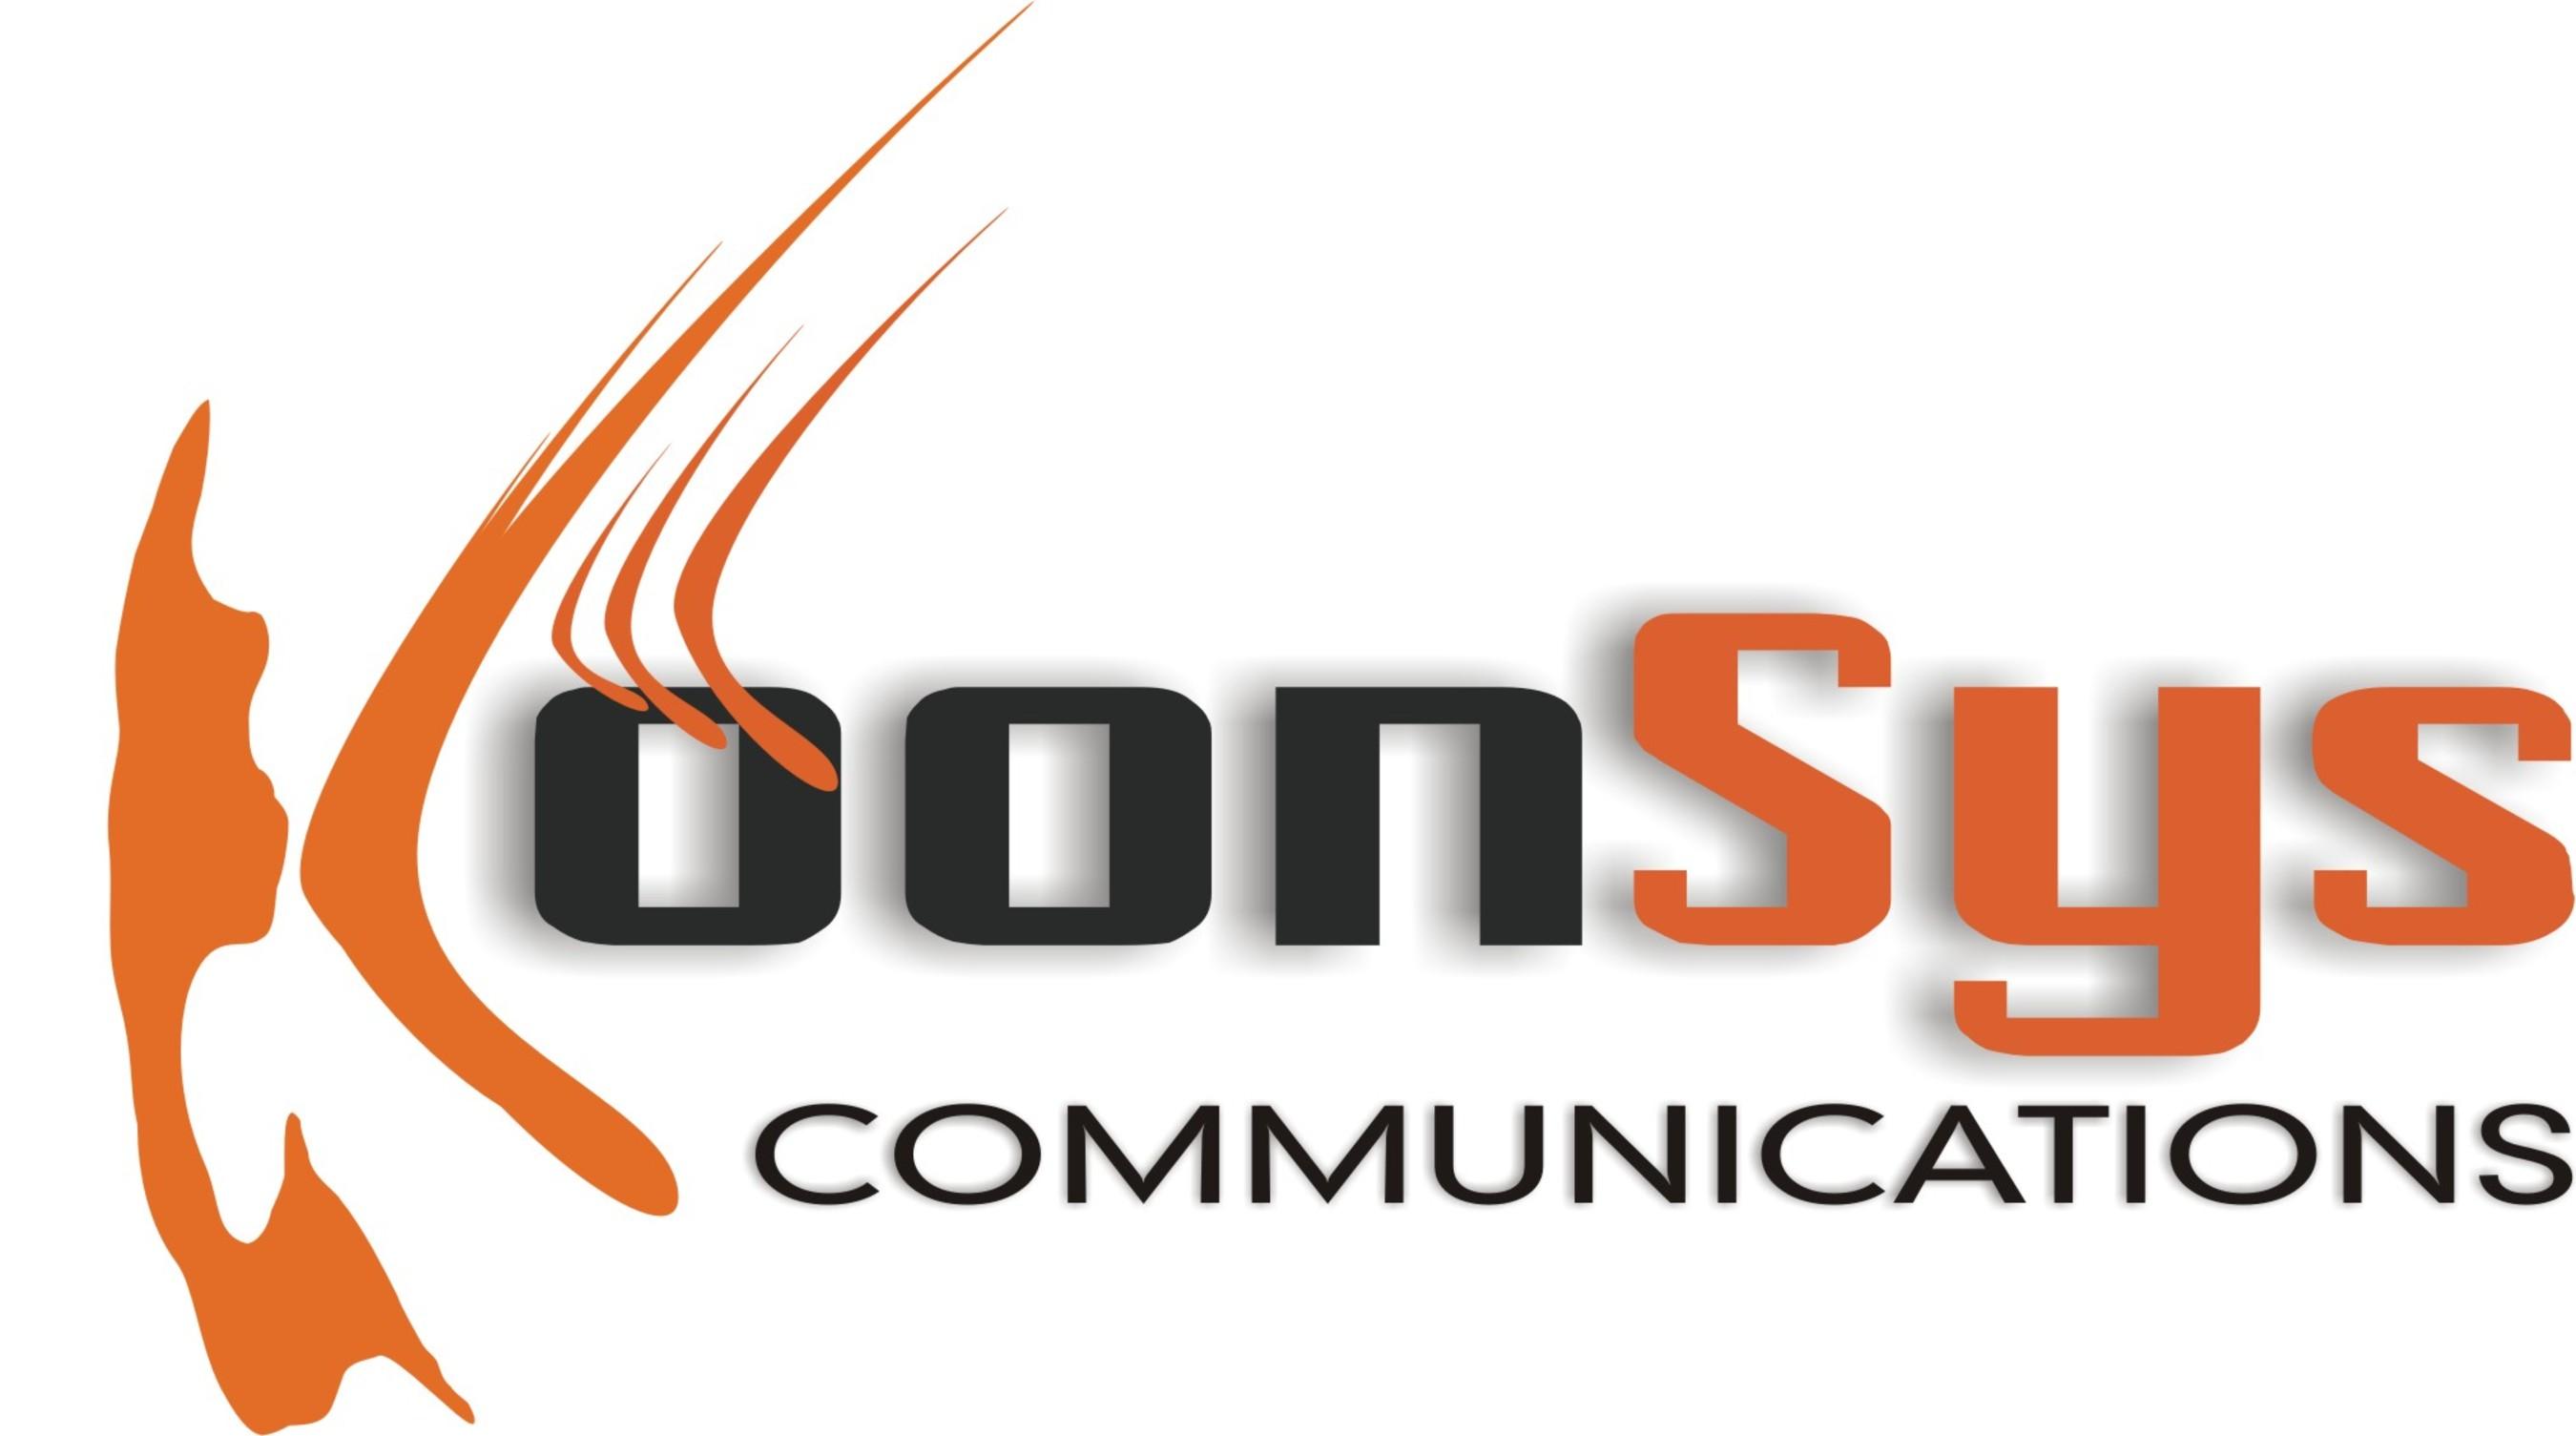 Koonsys Radiocommunications logo (PRNewsFoto/Koonsys Radiocommunications) (PRNewsFoto/Koonsys Radiocommunications)